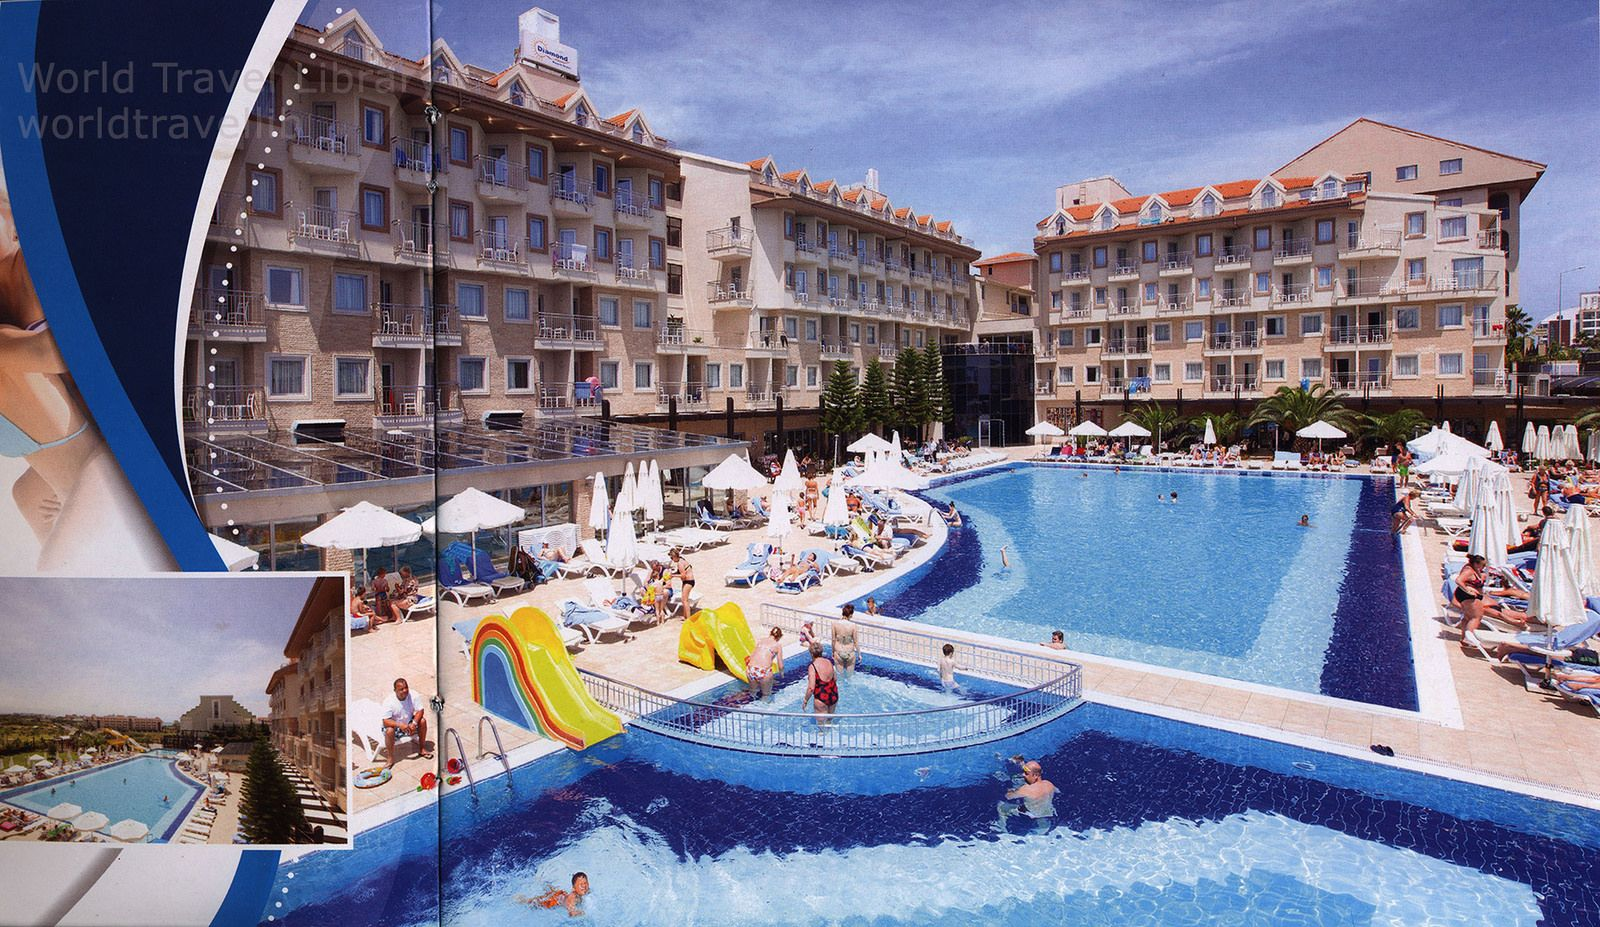 diamond hotels 2015 4 diamond beach hotel spa side antalya prov turkey side antalya. Black Bedroom Furniture Sets. Home Design Ideas